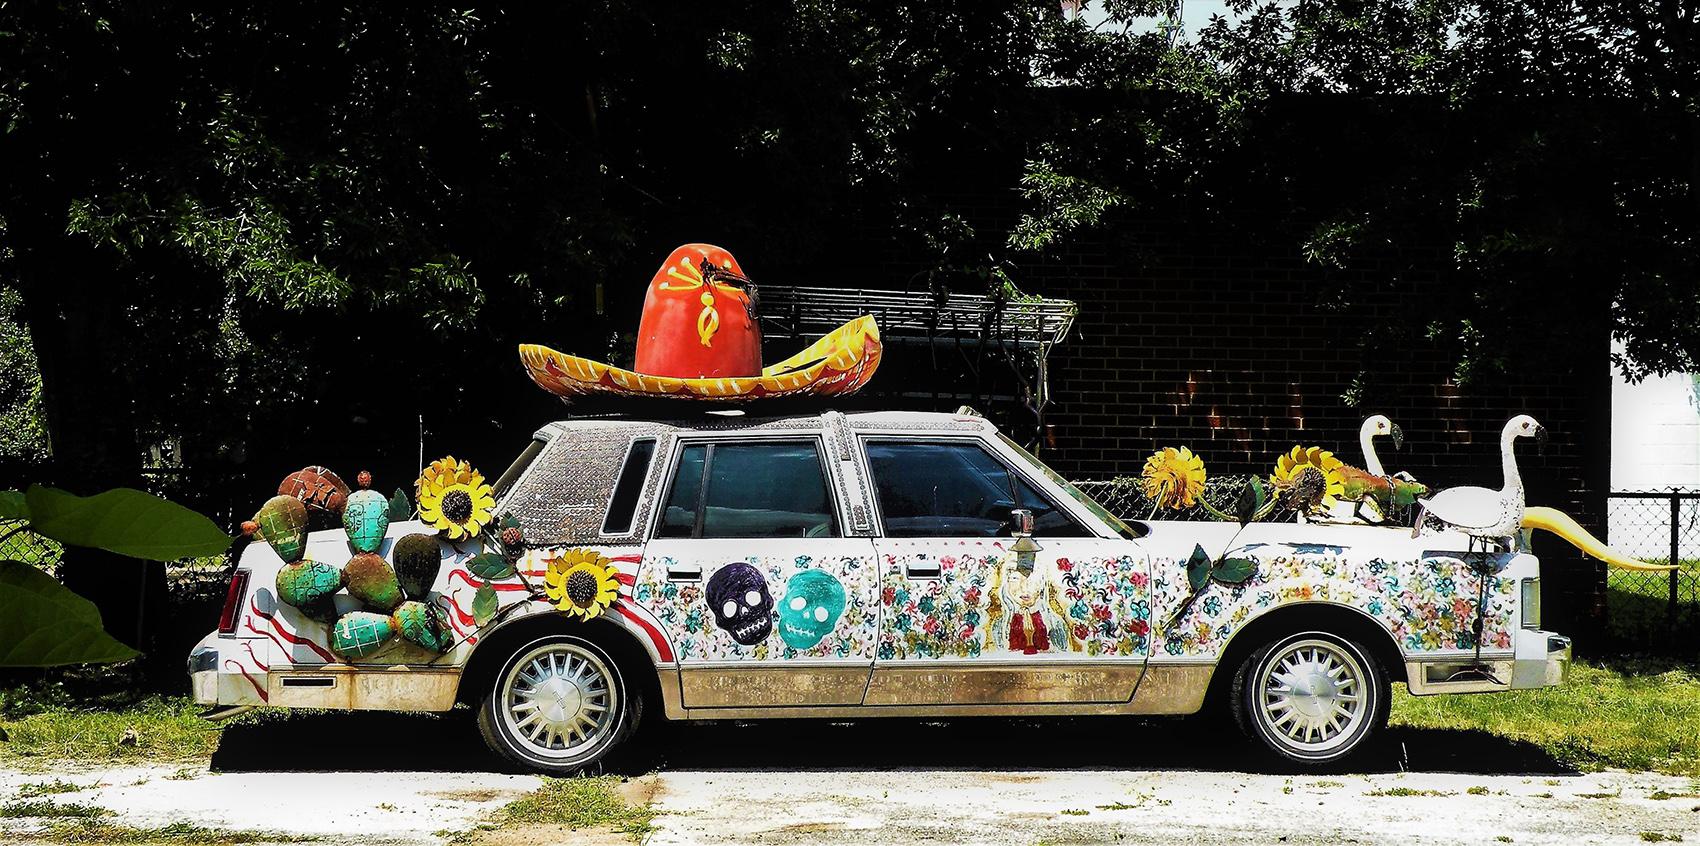 photo of decorated car - Cultura on Wheels by Anjela Villarreal Ratliff